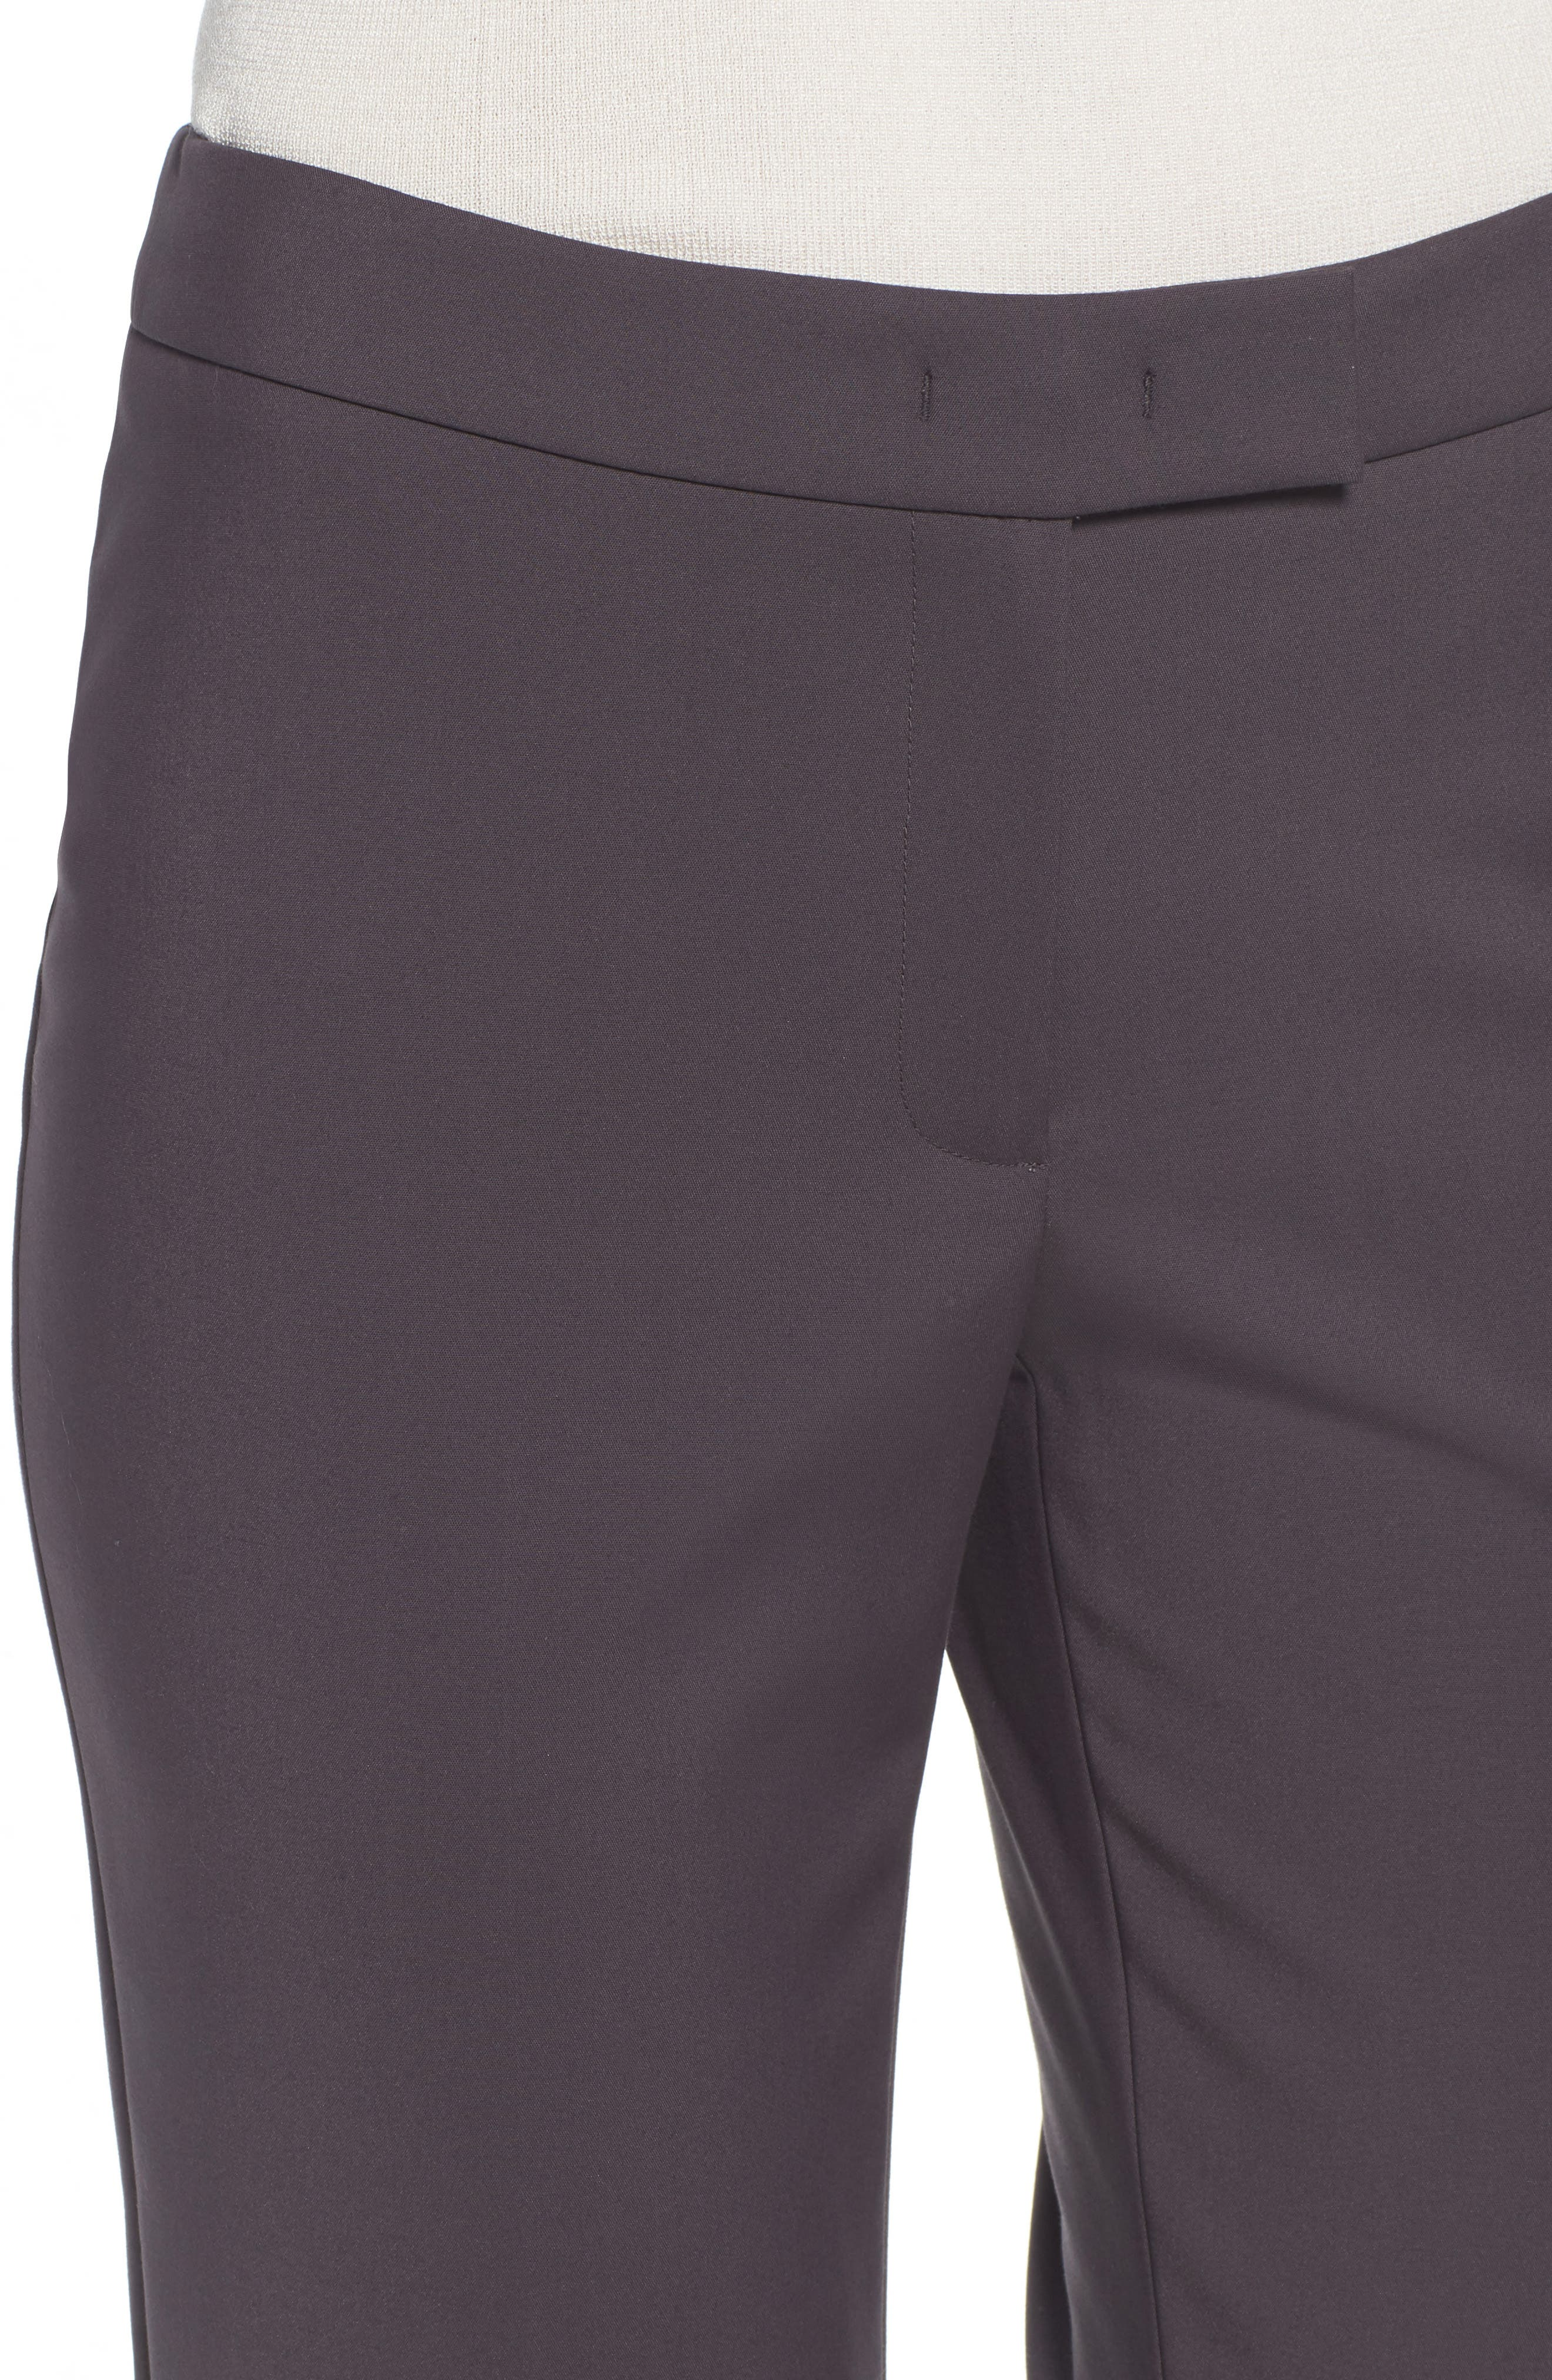 Slim Ankle Pants,                             Alternate thumbnail 4, color,                             021